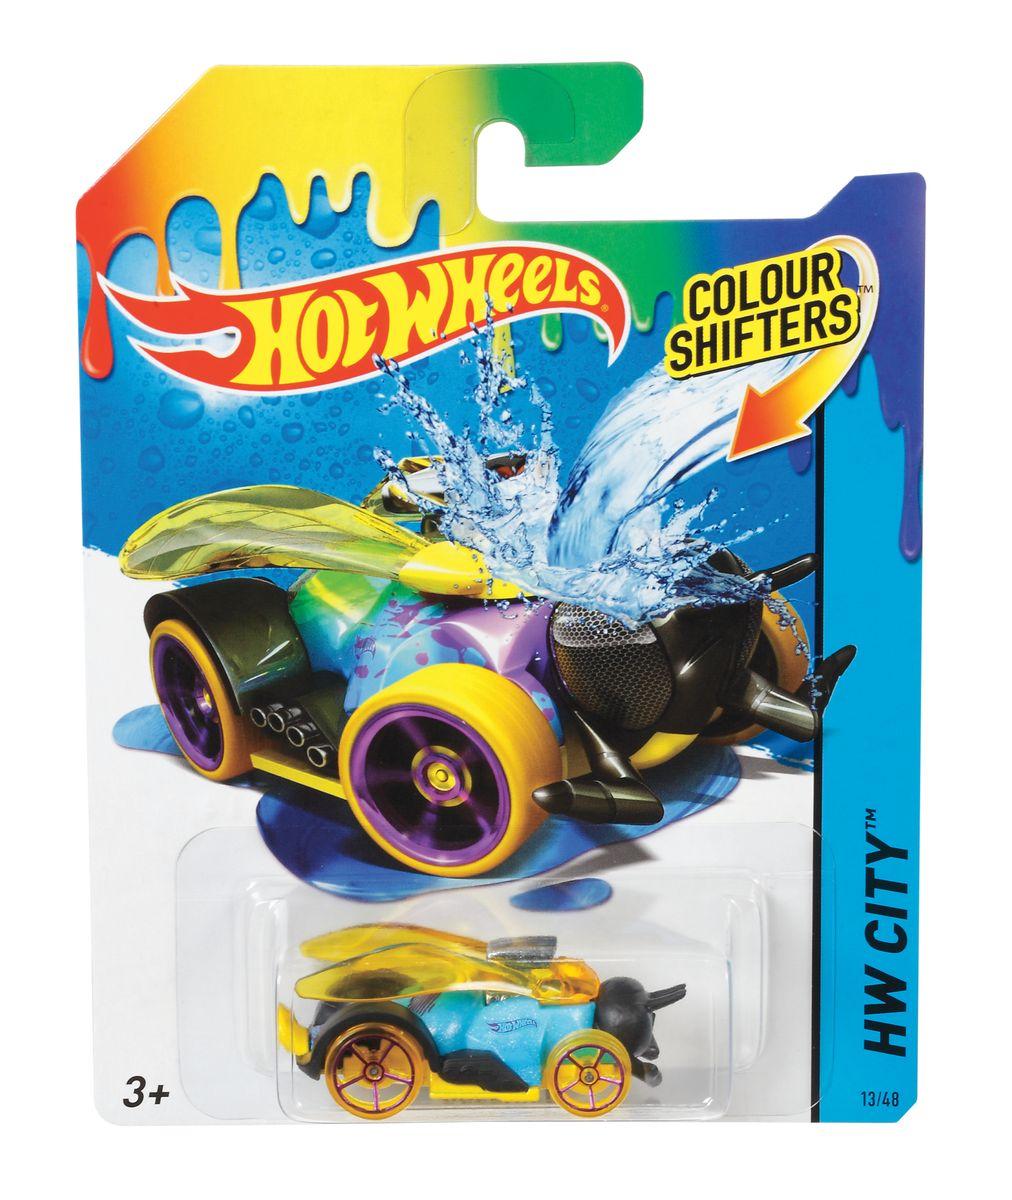 Hot Wheels Машинка, меняющая цвет Color shifters hot wheels color shifters машинка dodge charger r t